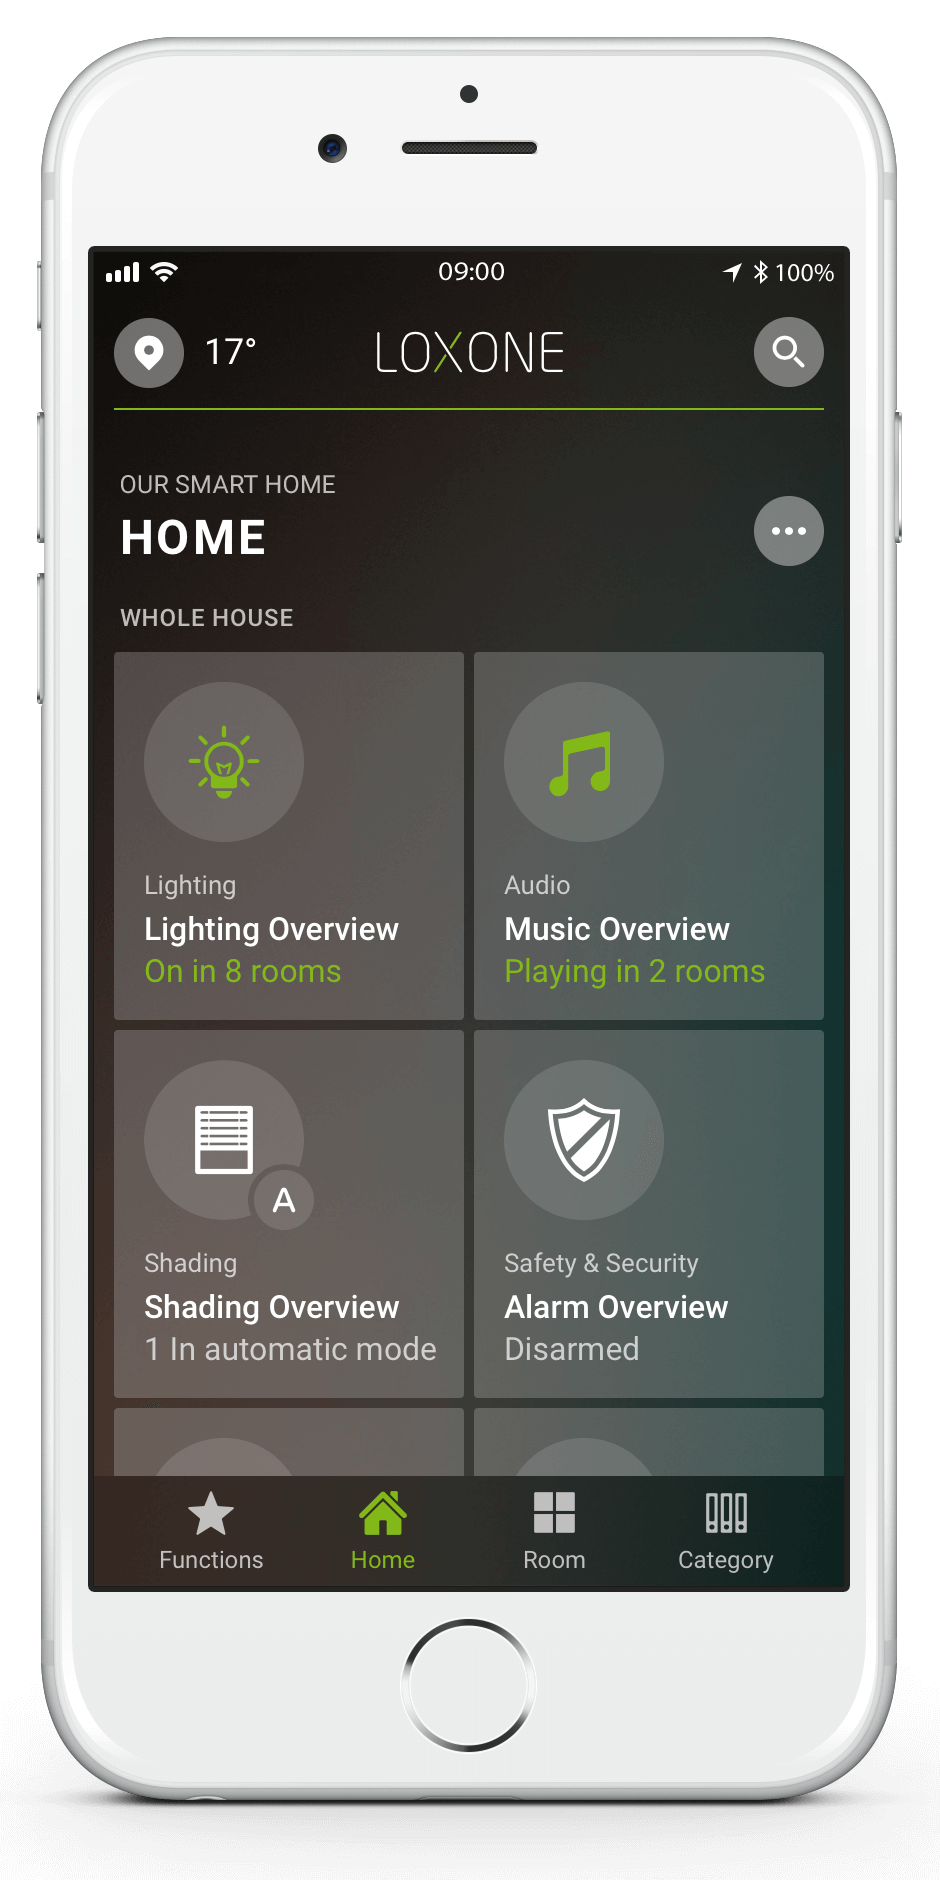 loxone smart home konfigurator alexa mach die planung. Black Bedroom Furniture Sets. Home Design Ideas